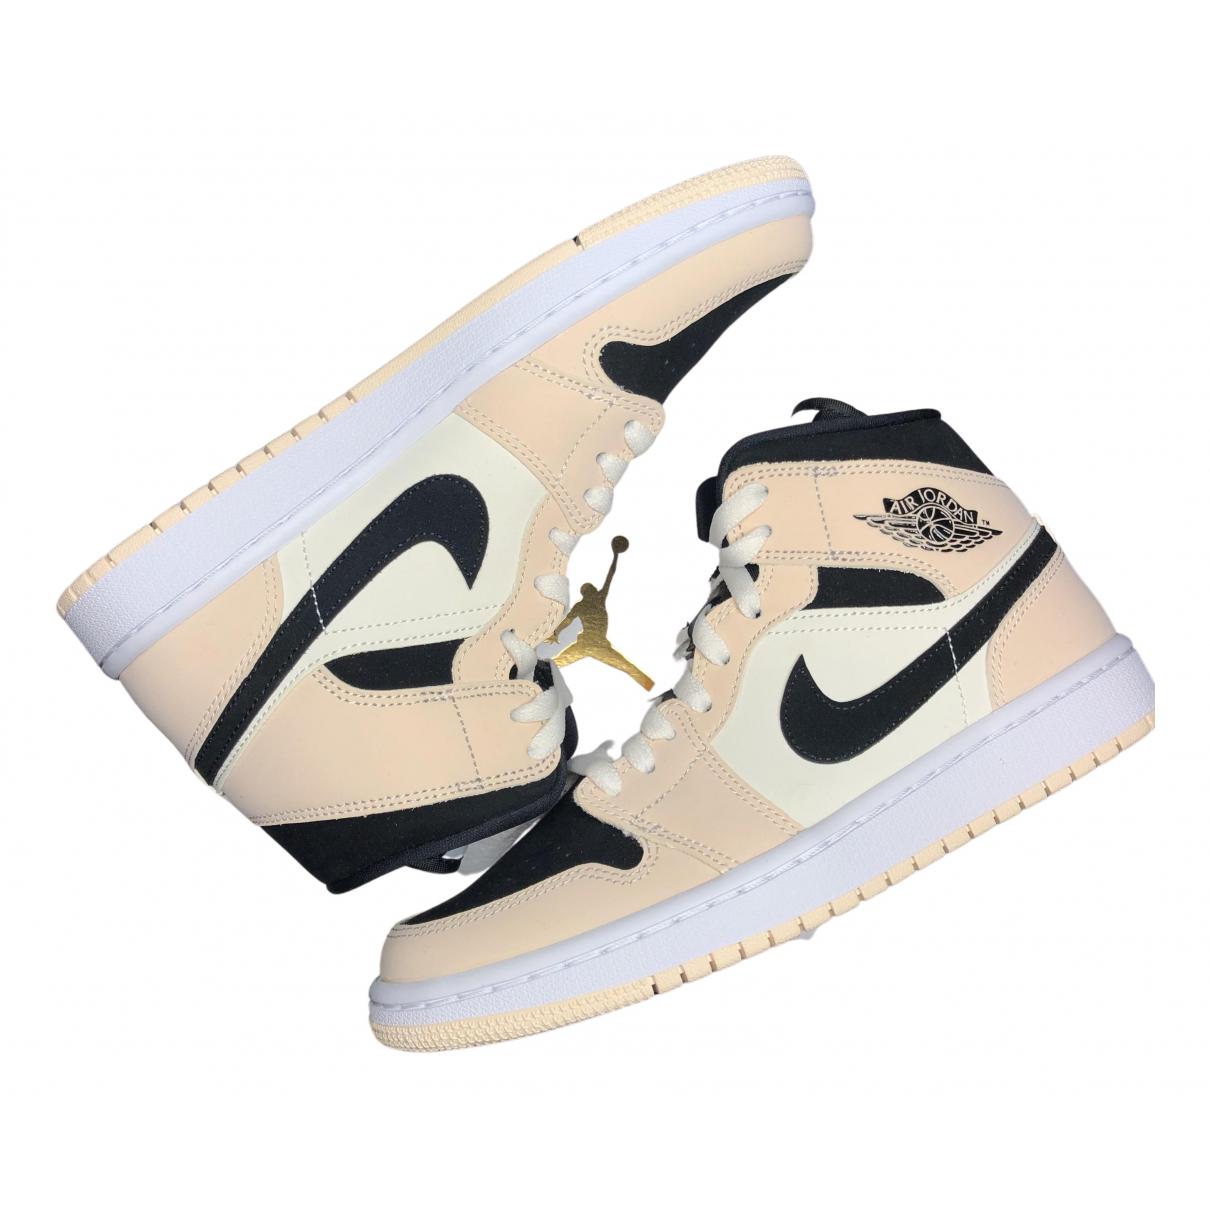 Jordan - Baskets Air Jordan 1  pour femme en suede - beige